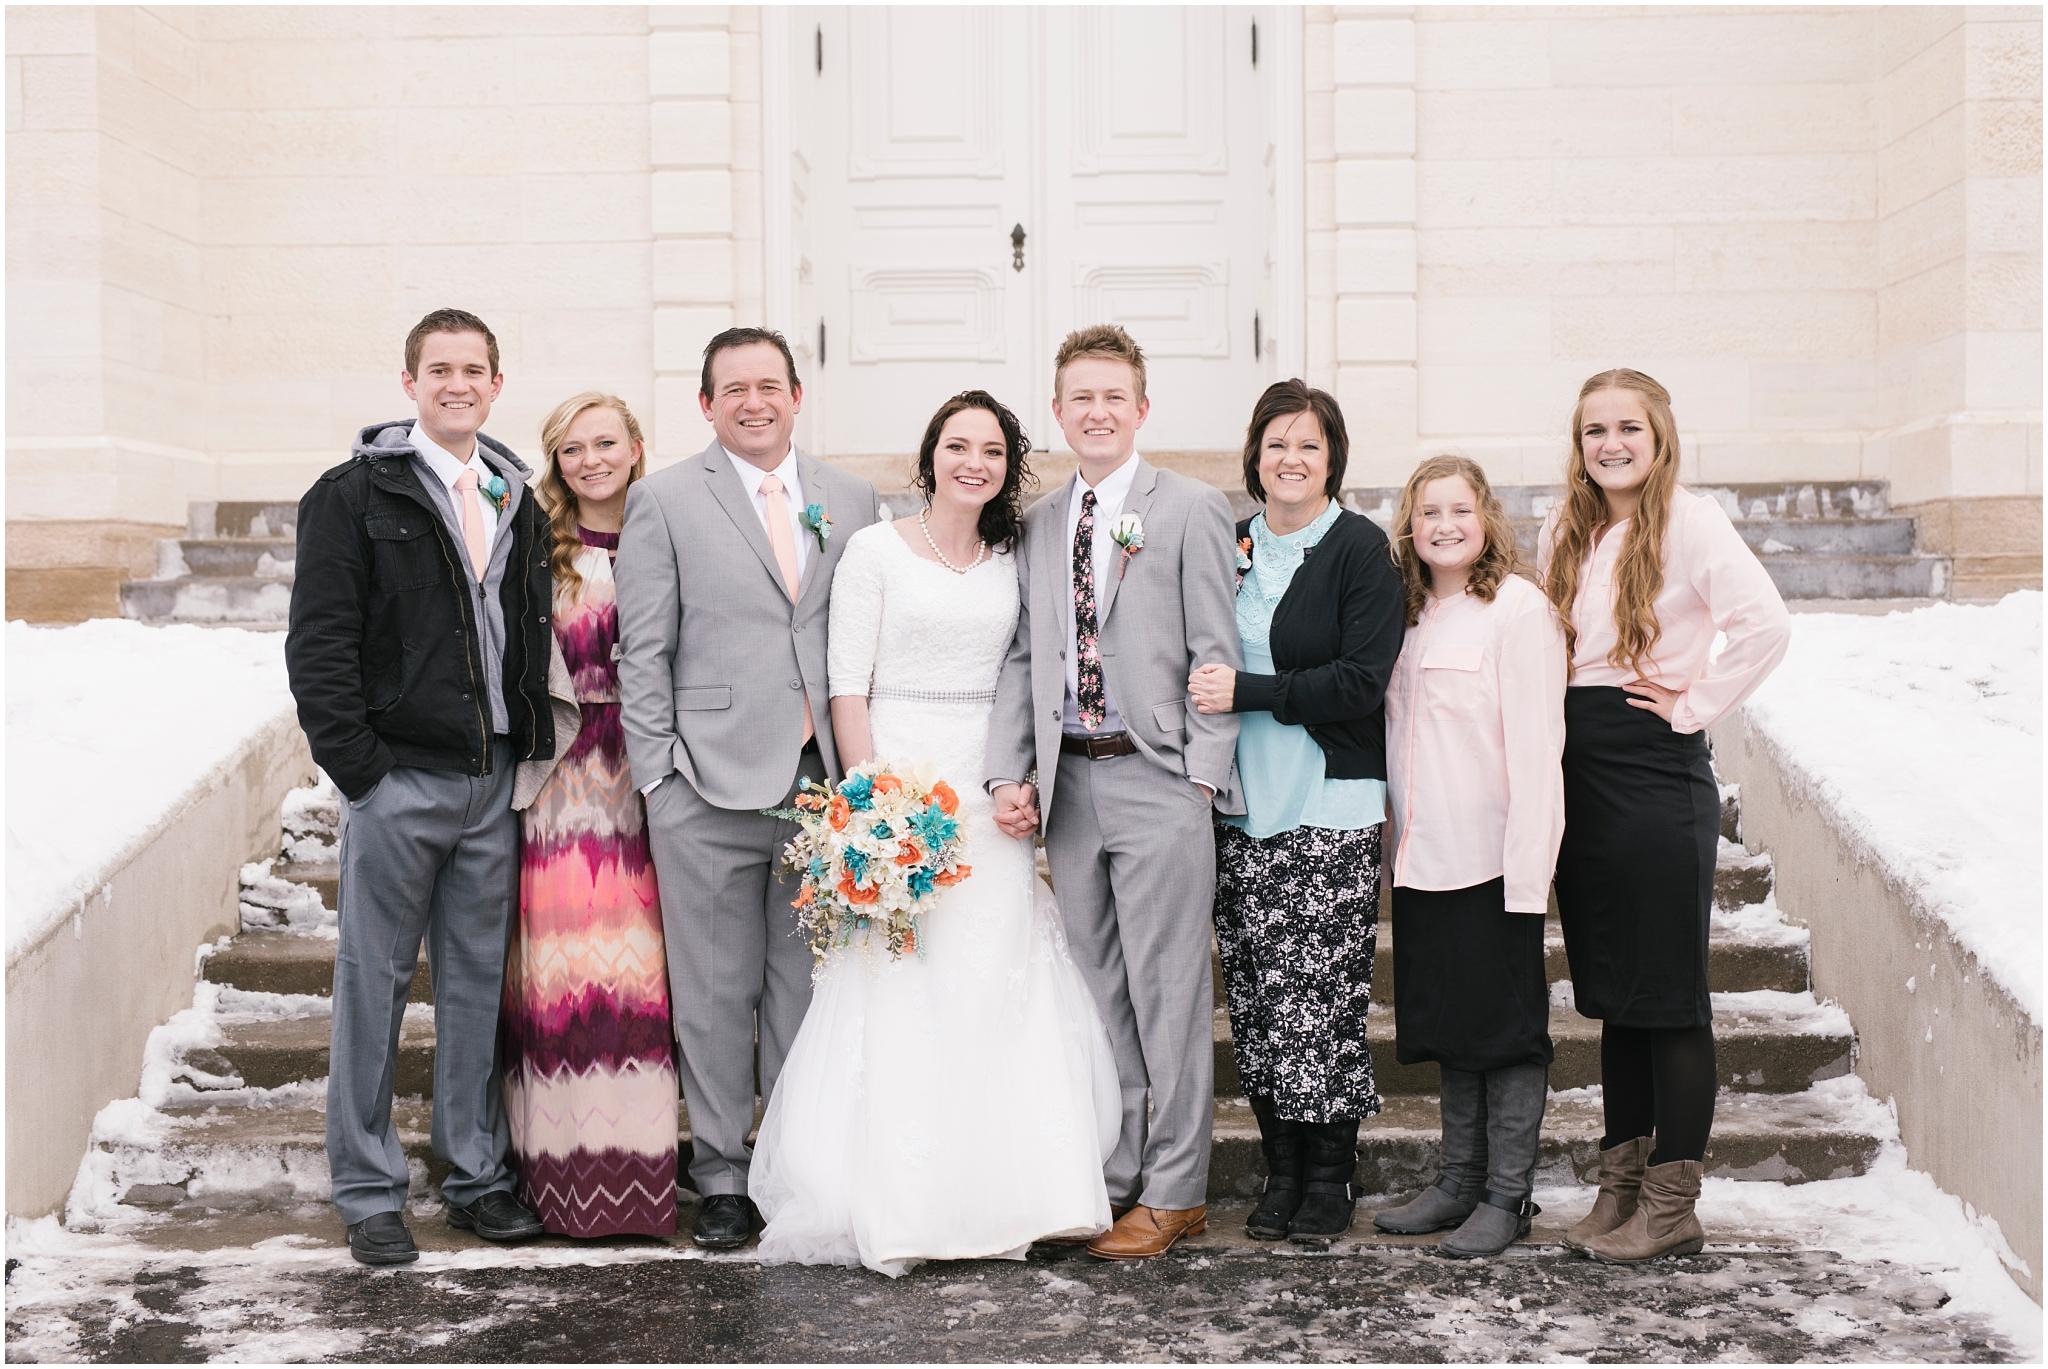 Bo Alyssa Wedding-64_Lizzie-B-Imagery-Utah-Wedding-Photographer-Central-Utah-Photographer-Utah-County-Manti-Temple.jpg